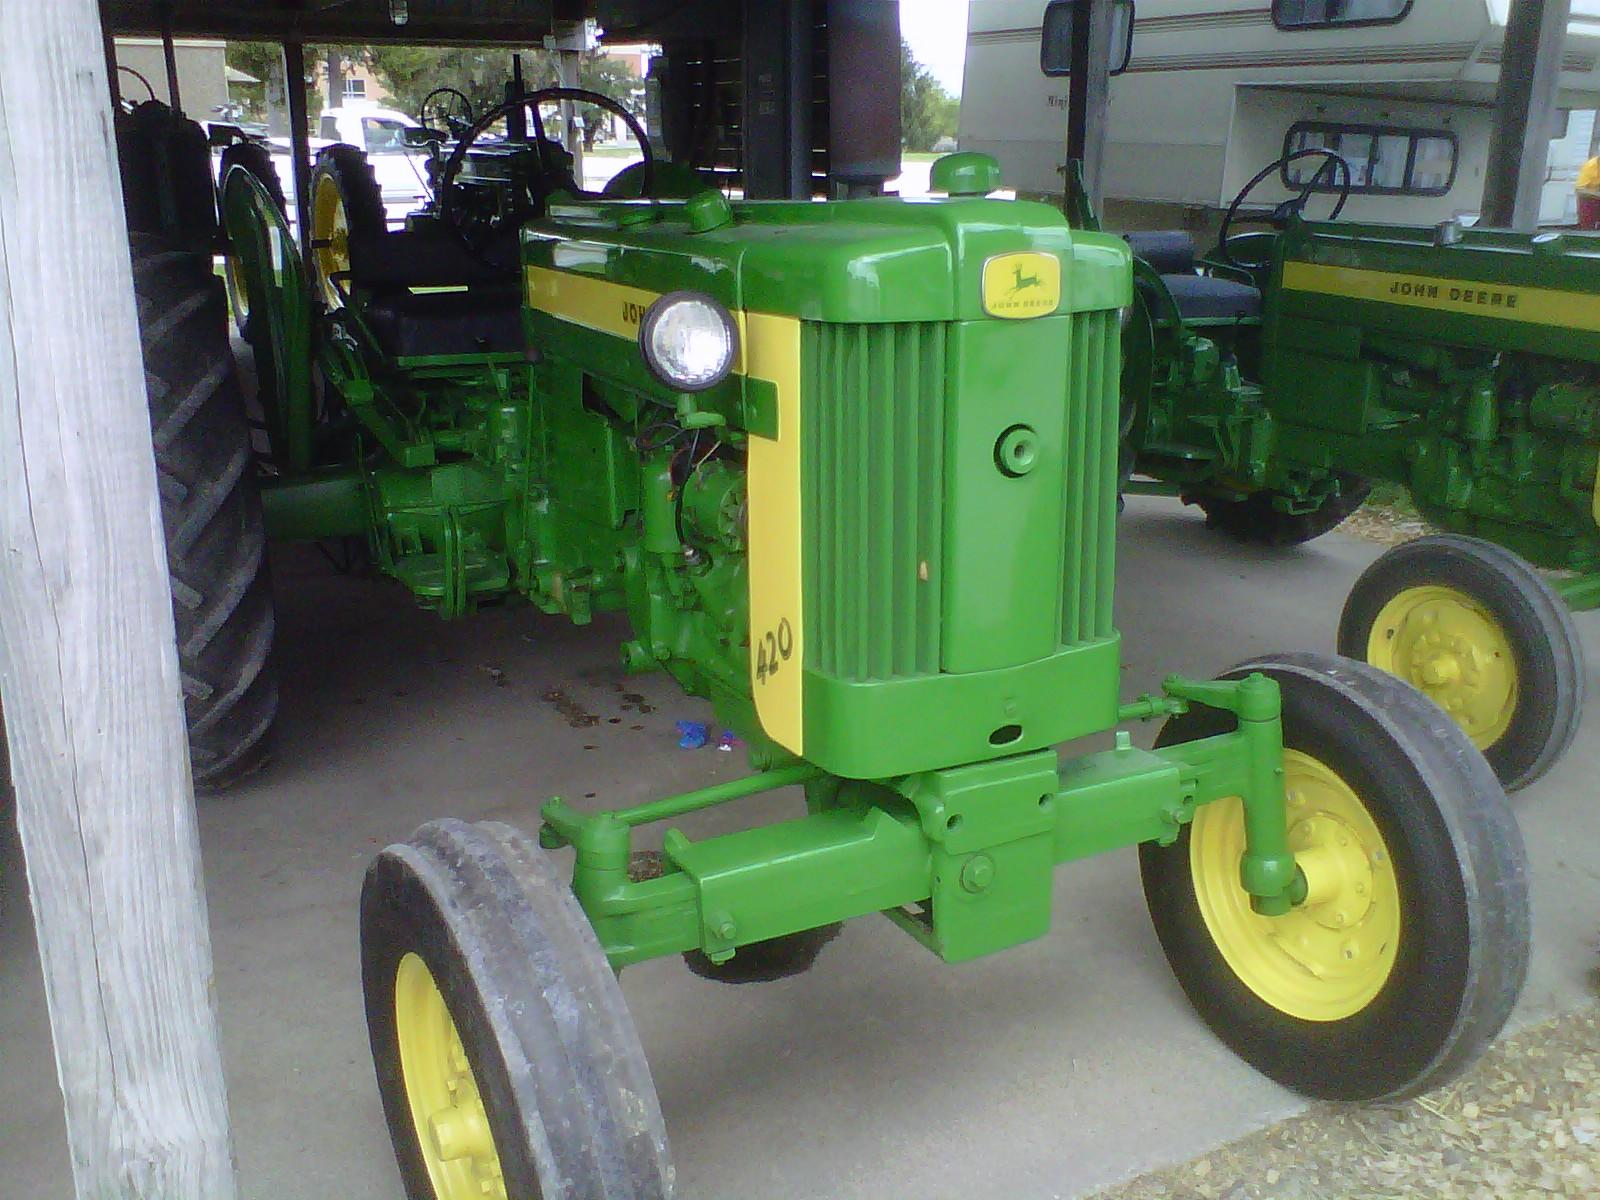 John Deere 420 Tractor Construction Plant Wiki Fandom Powered By Wikia